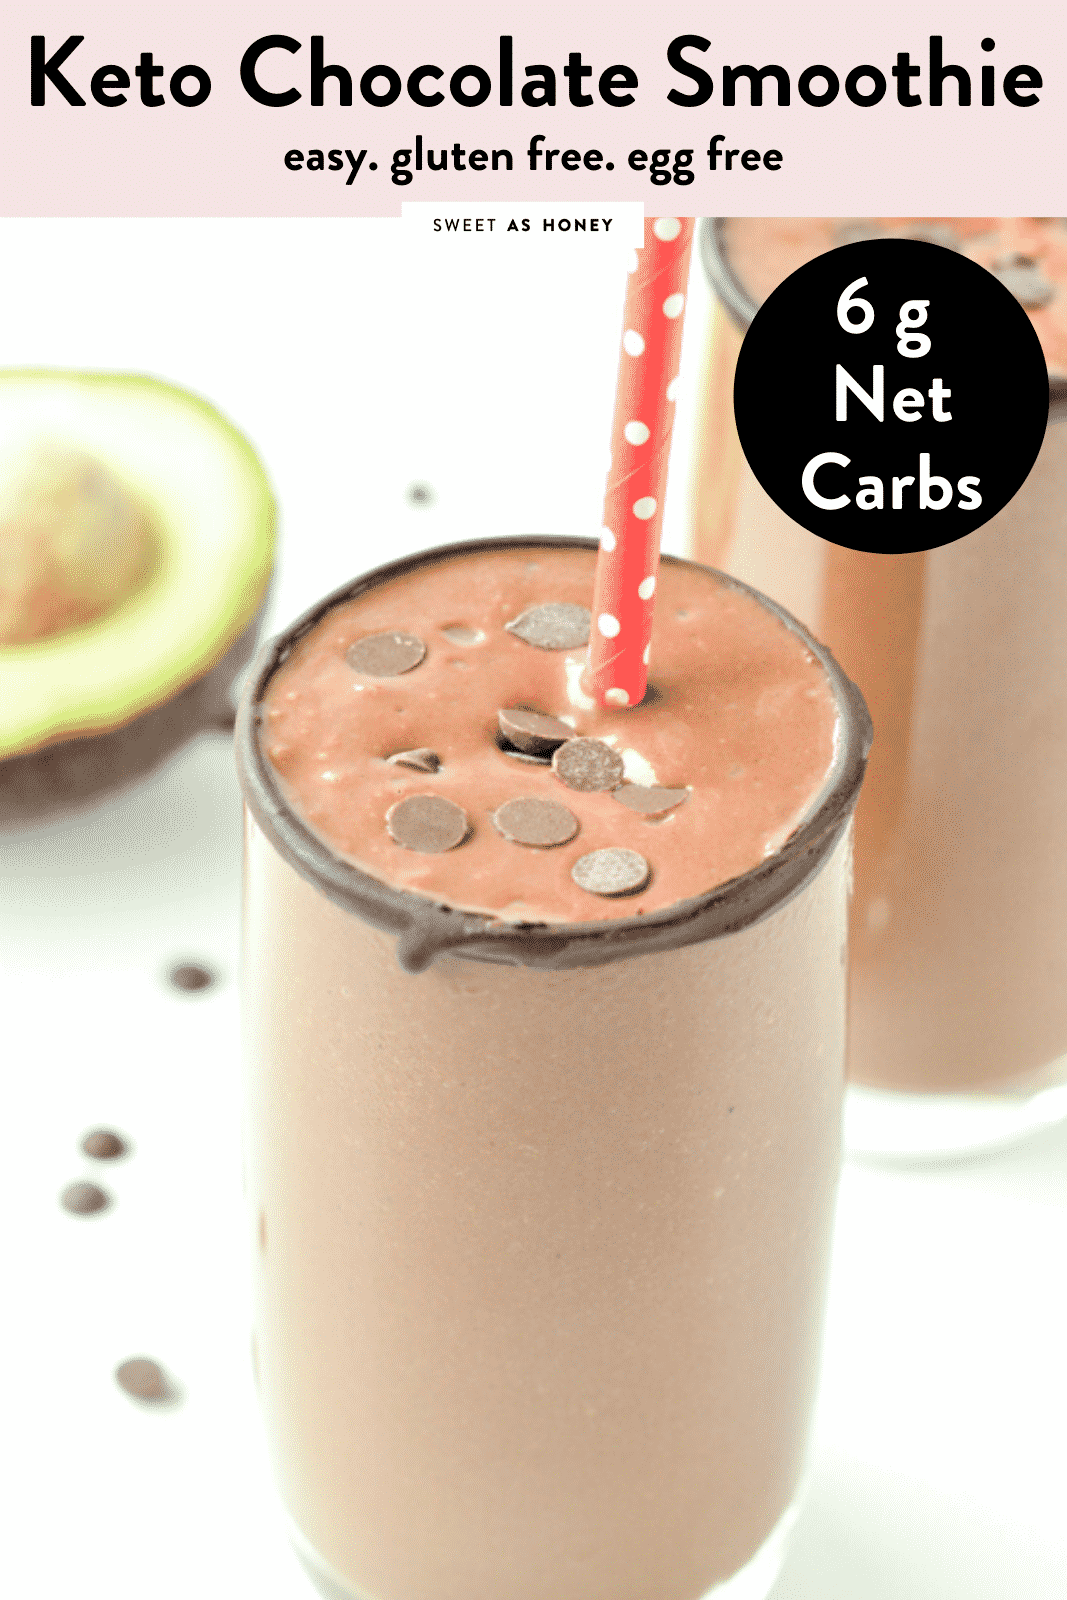 KETO CHOCOLATE AVOCADO SMOOTHIE An healthy keto avocado smoothie, dairy free using almond milk and of course no banana! #chocolateavocadosmoothie #ketochocolateavocadosmoothie #healthychocolateavocadosmoothie #healthy #easy #chocolate #avocado #nobanana #lowcarb #forkids #protein #vegan #breakfast